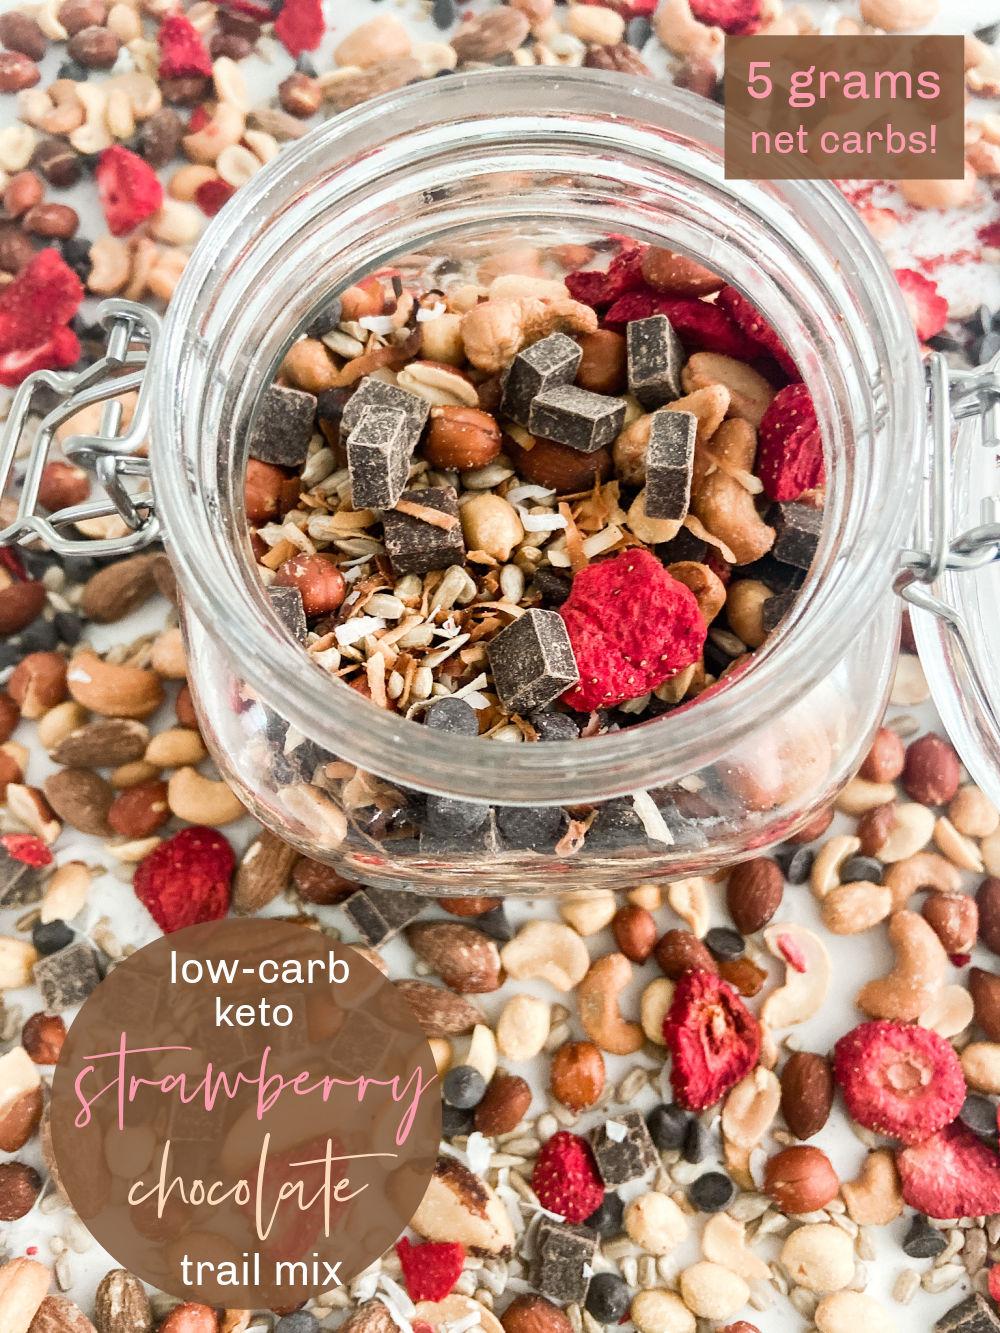 Low Carb Keto Strawberry Chocolate Trail Mix